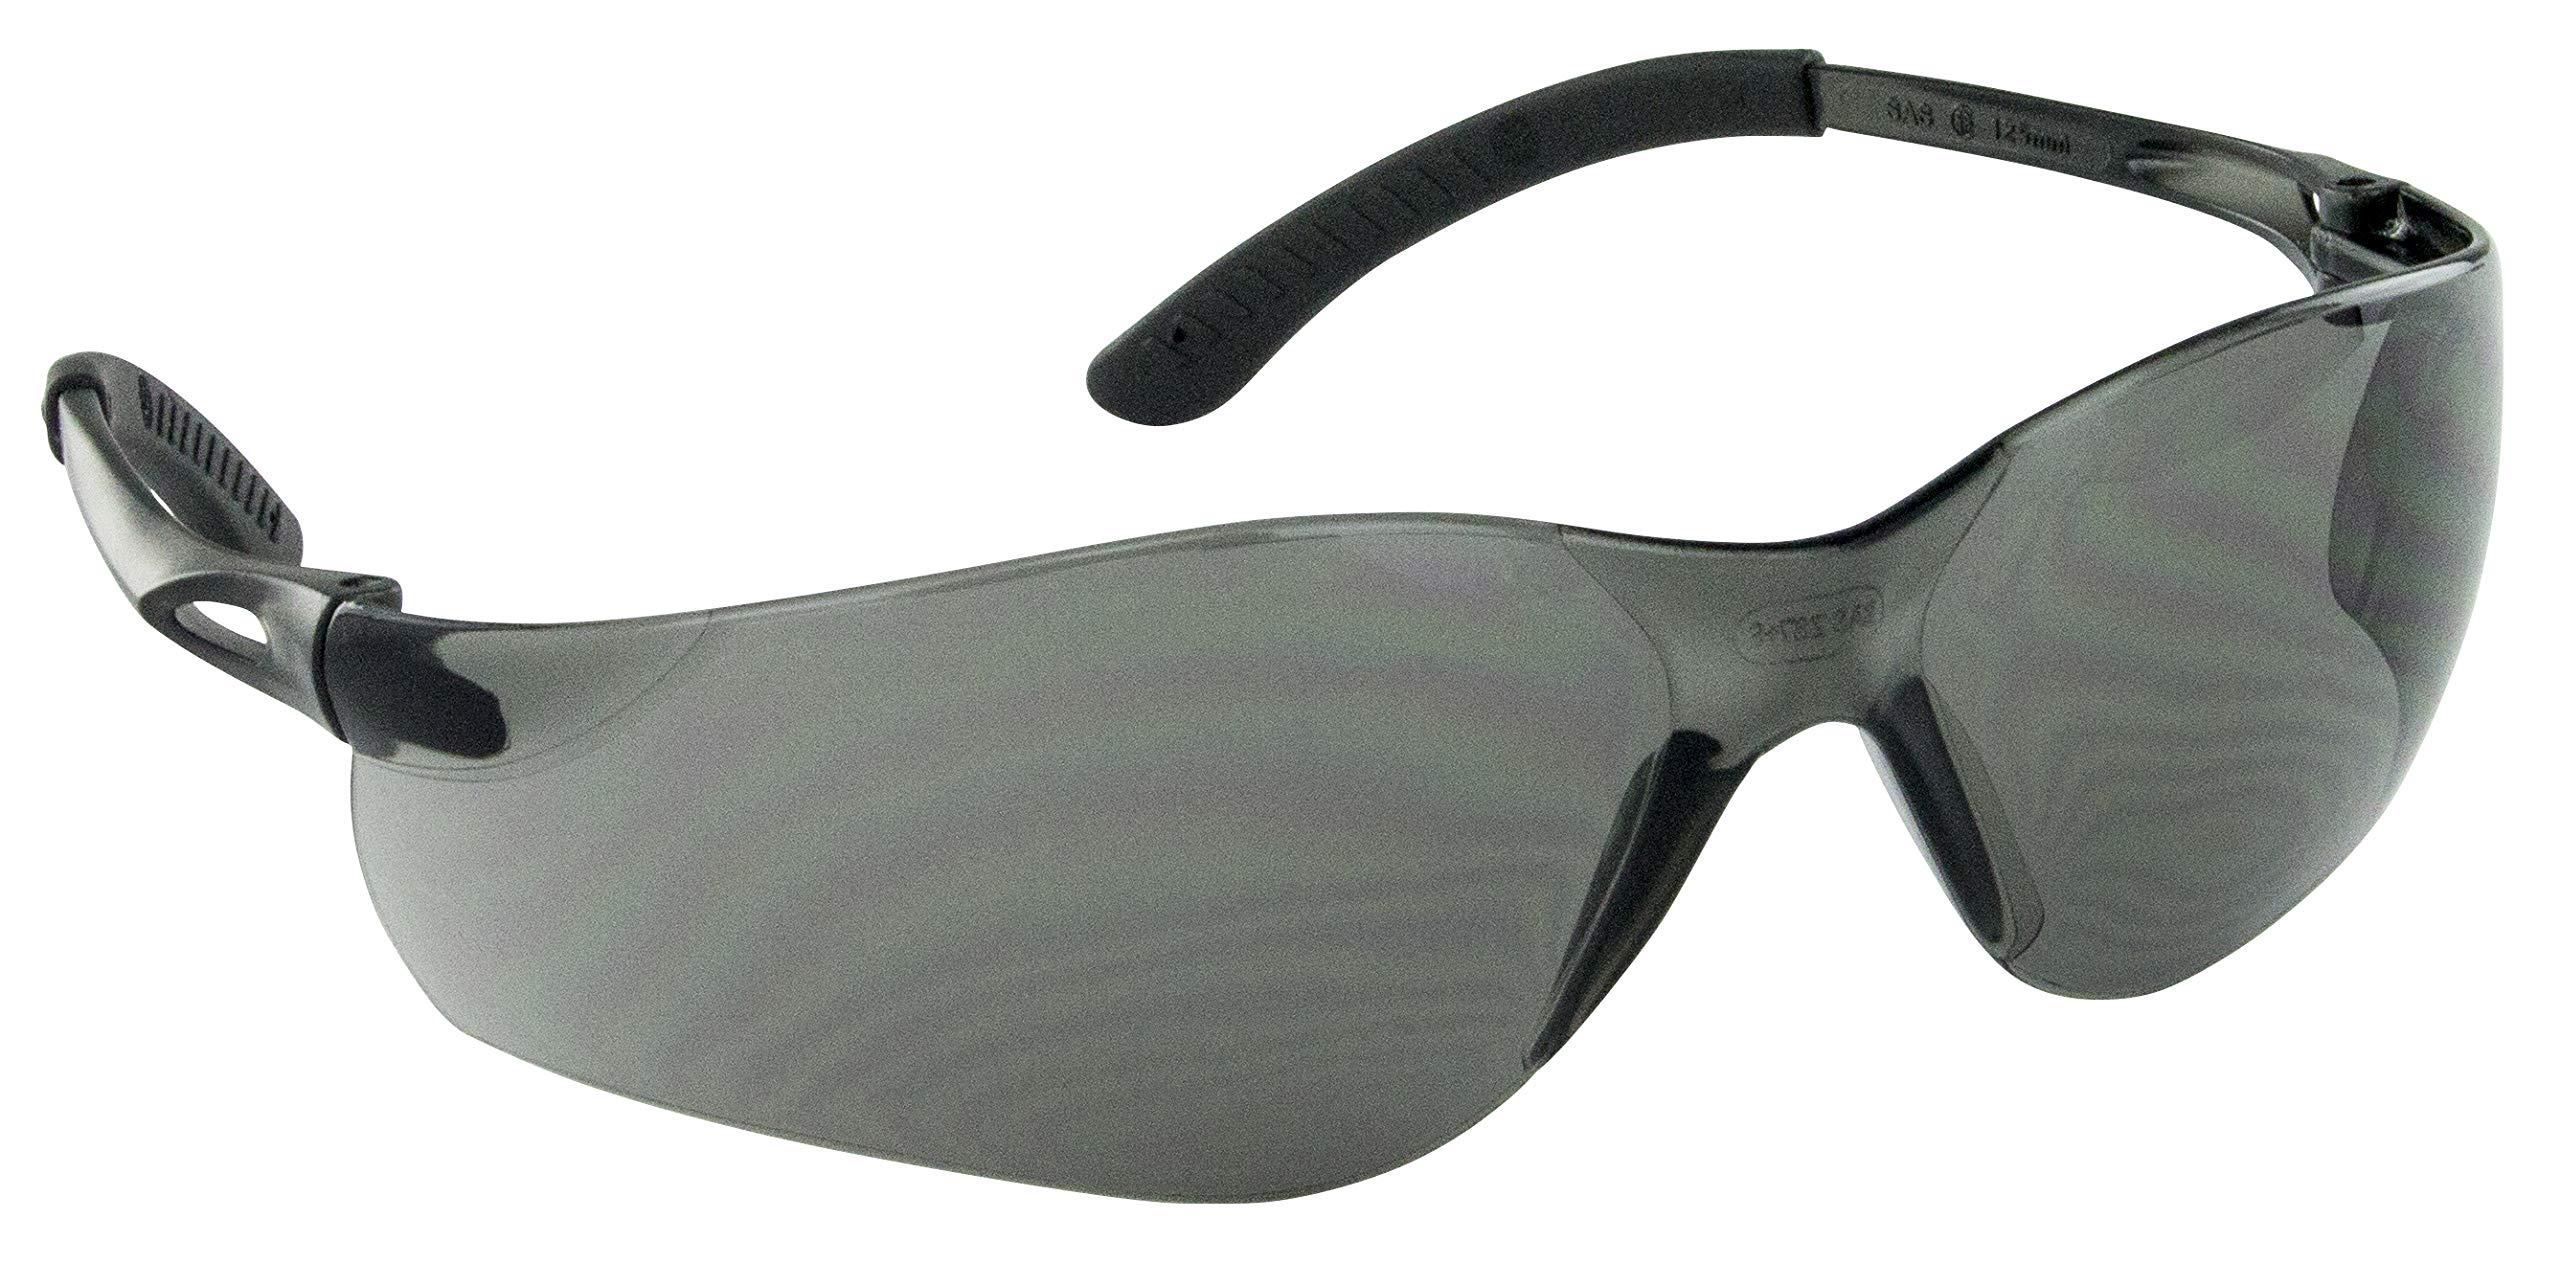 SAS Safety 5331 NSX Turbo Safety Glasses, Shade Lens